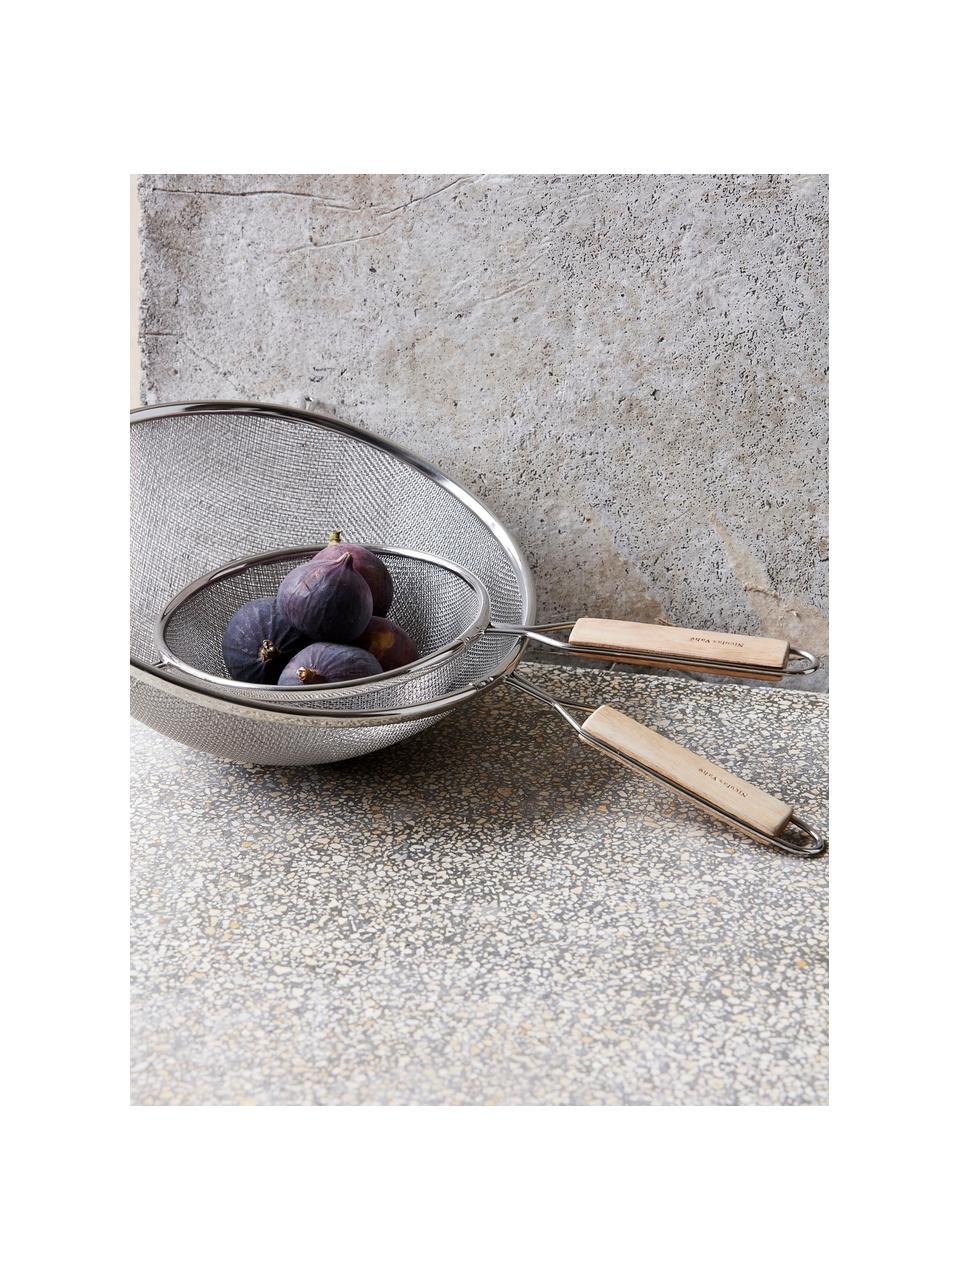 Küchensiebe Paka mit Holzgriff, 2er-Set, Sieb: Edelstahl, Griff: Holz, Edelstahl, Holz, Sondergrößen